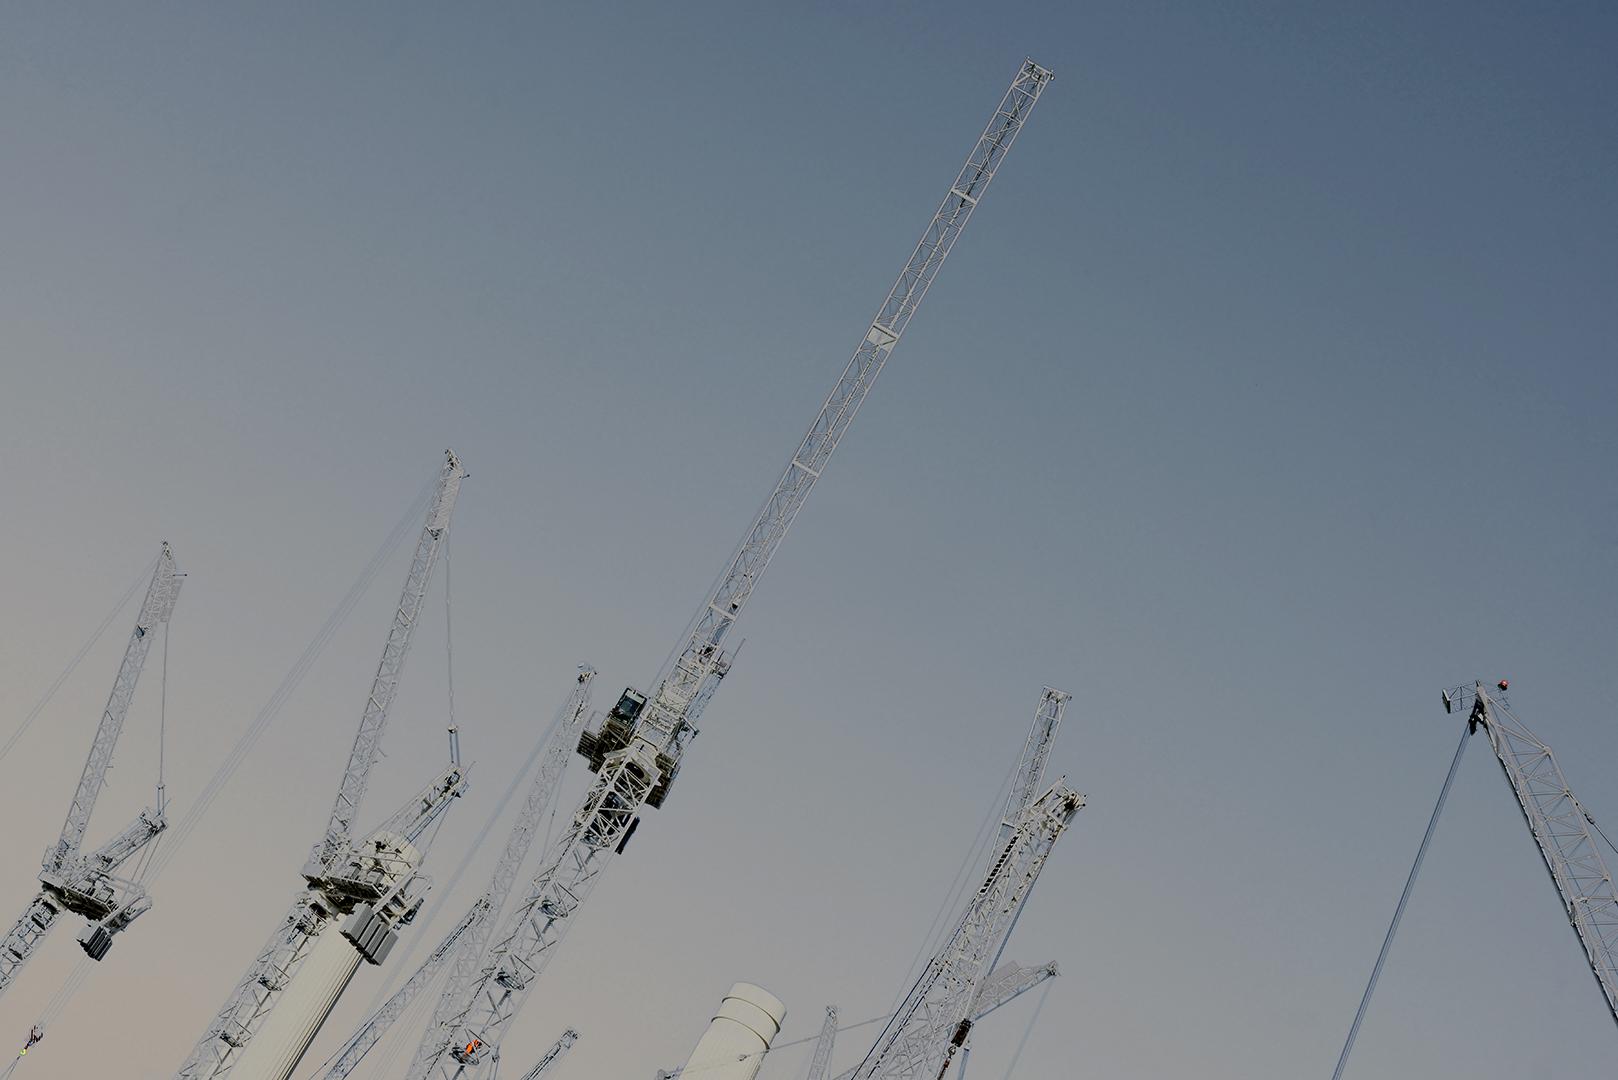 Cranes_7.jpg